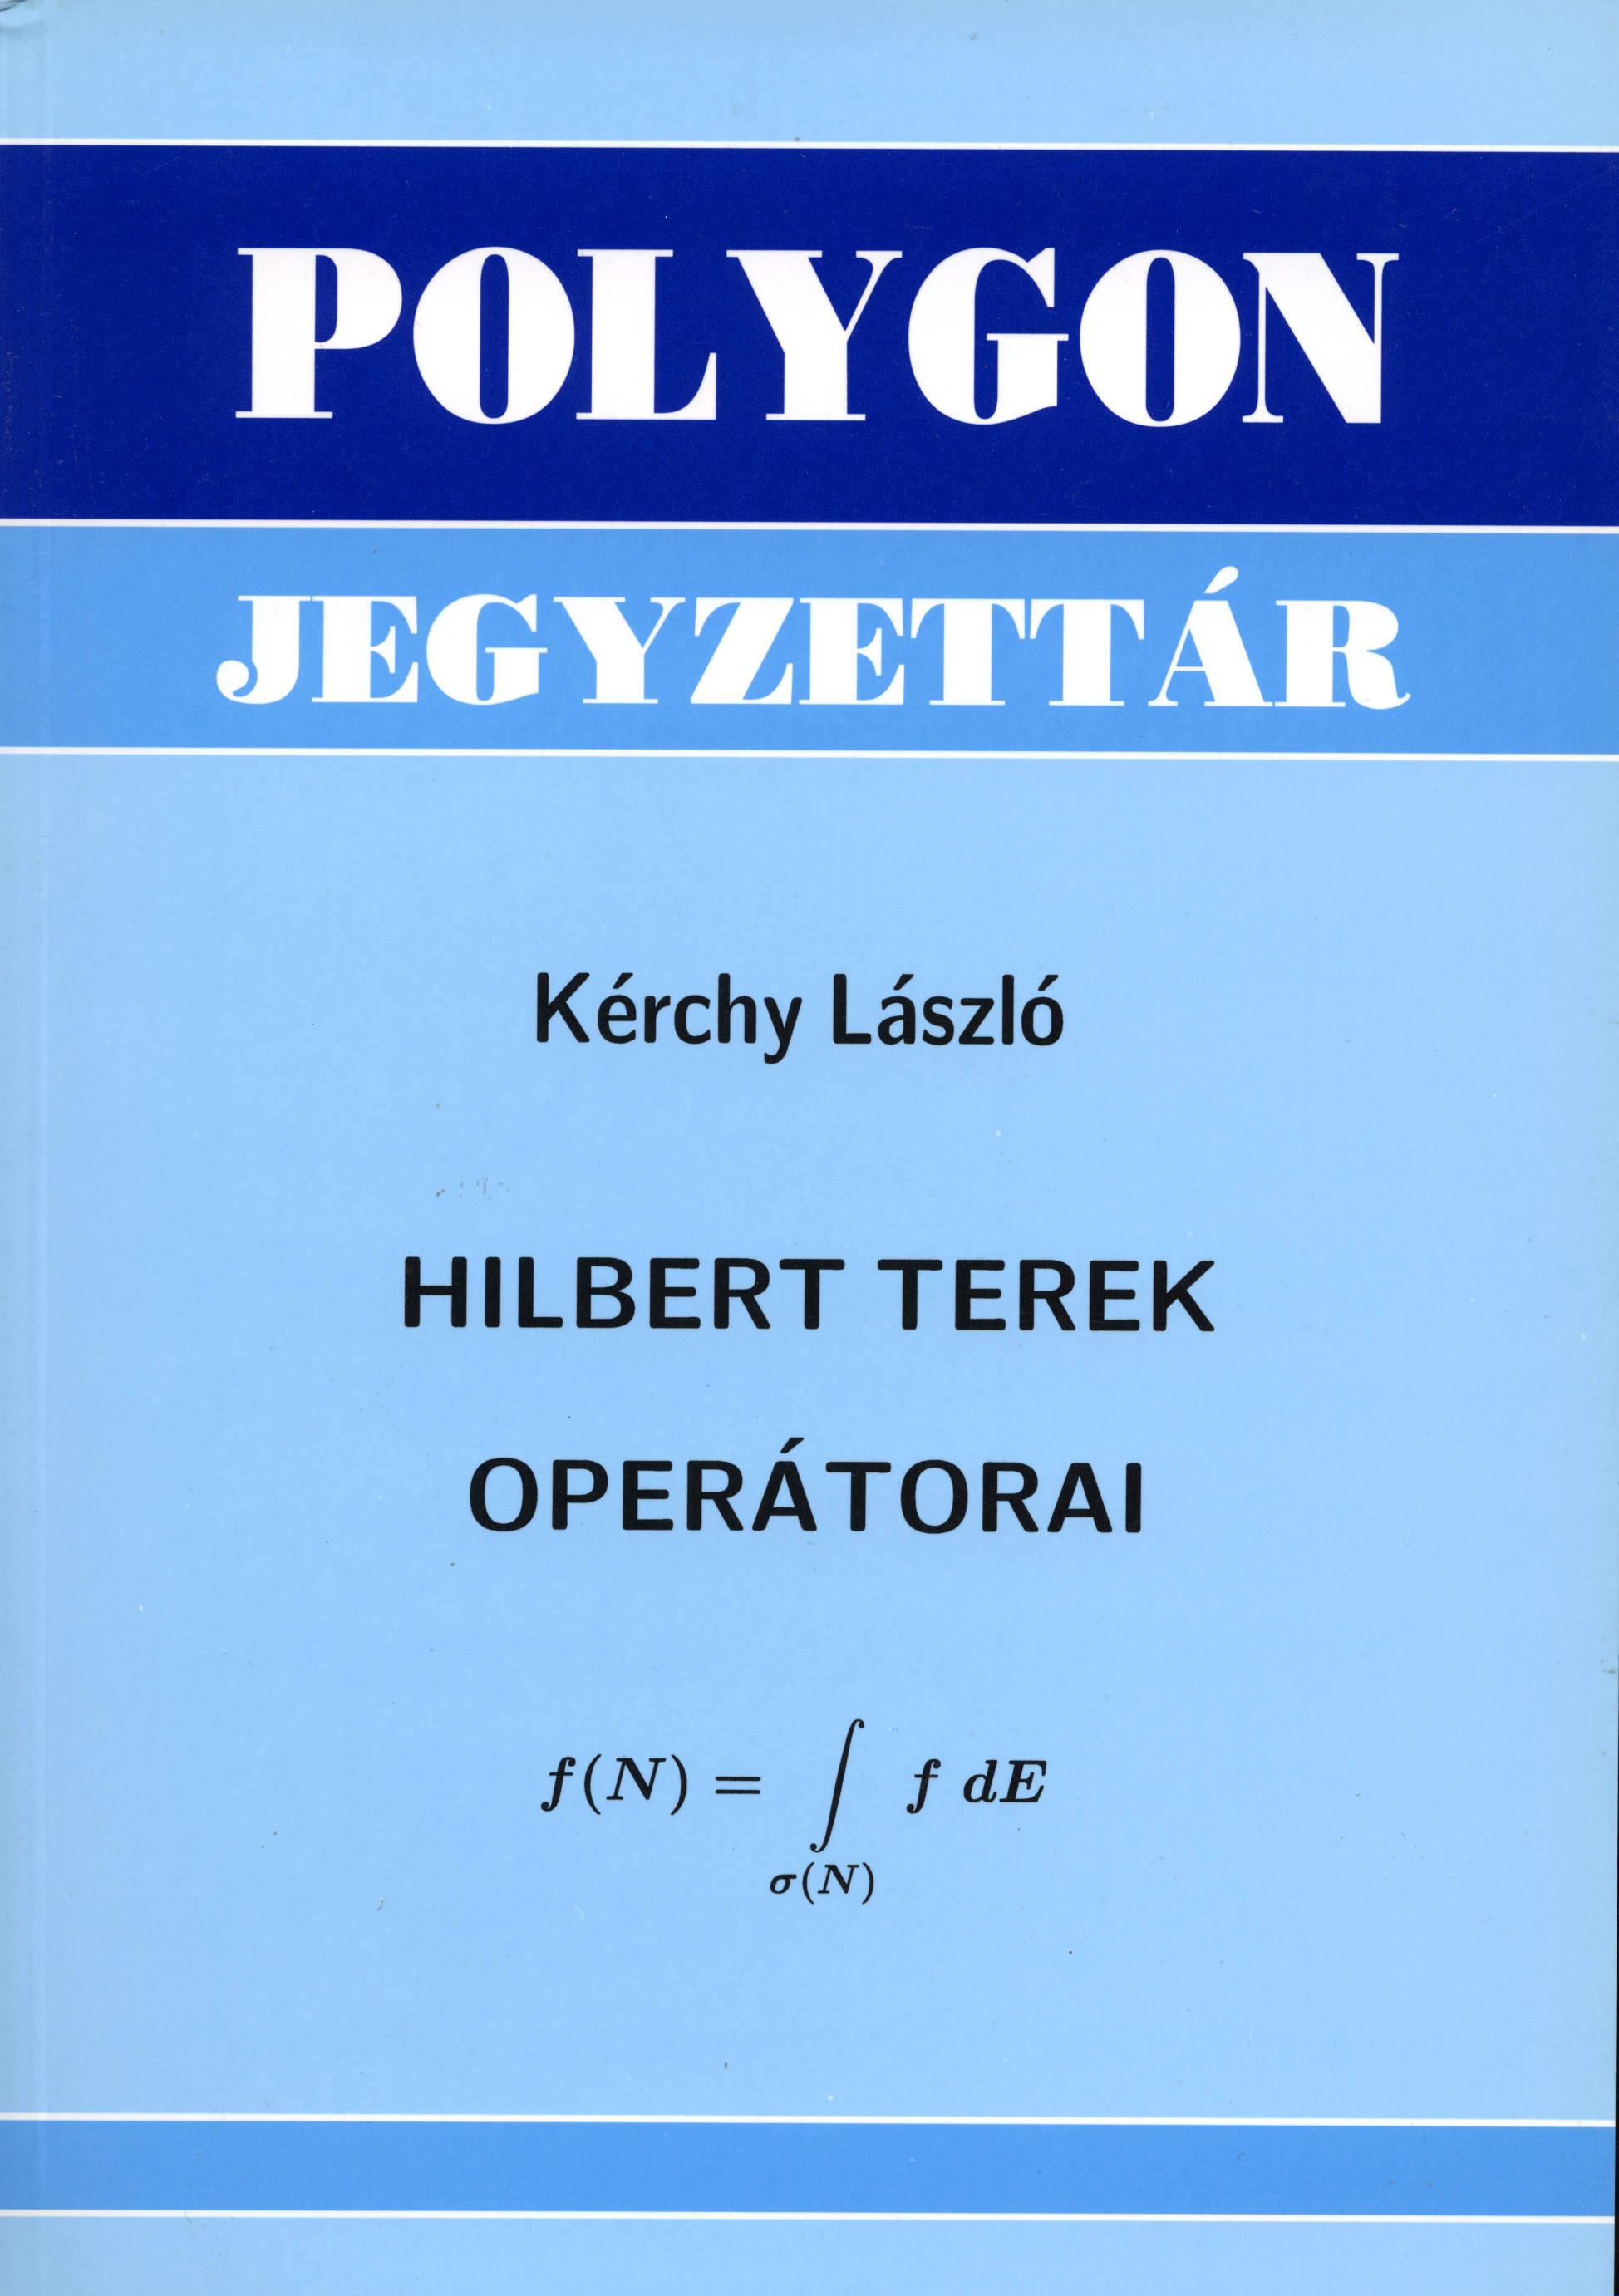 Hilbert terek operátorai - Polygon jegyzet